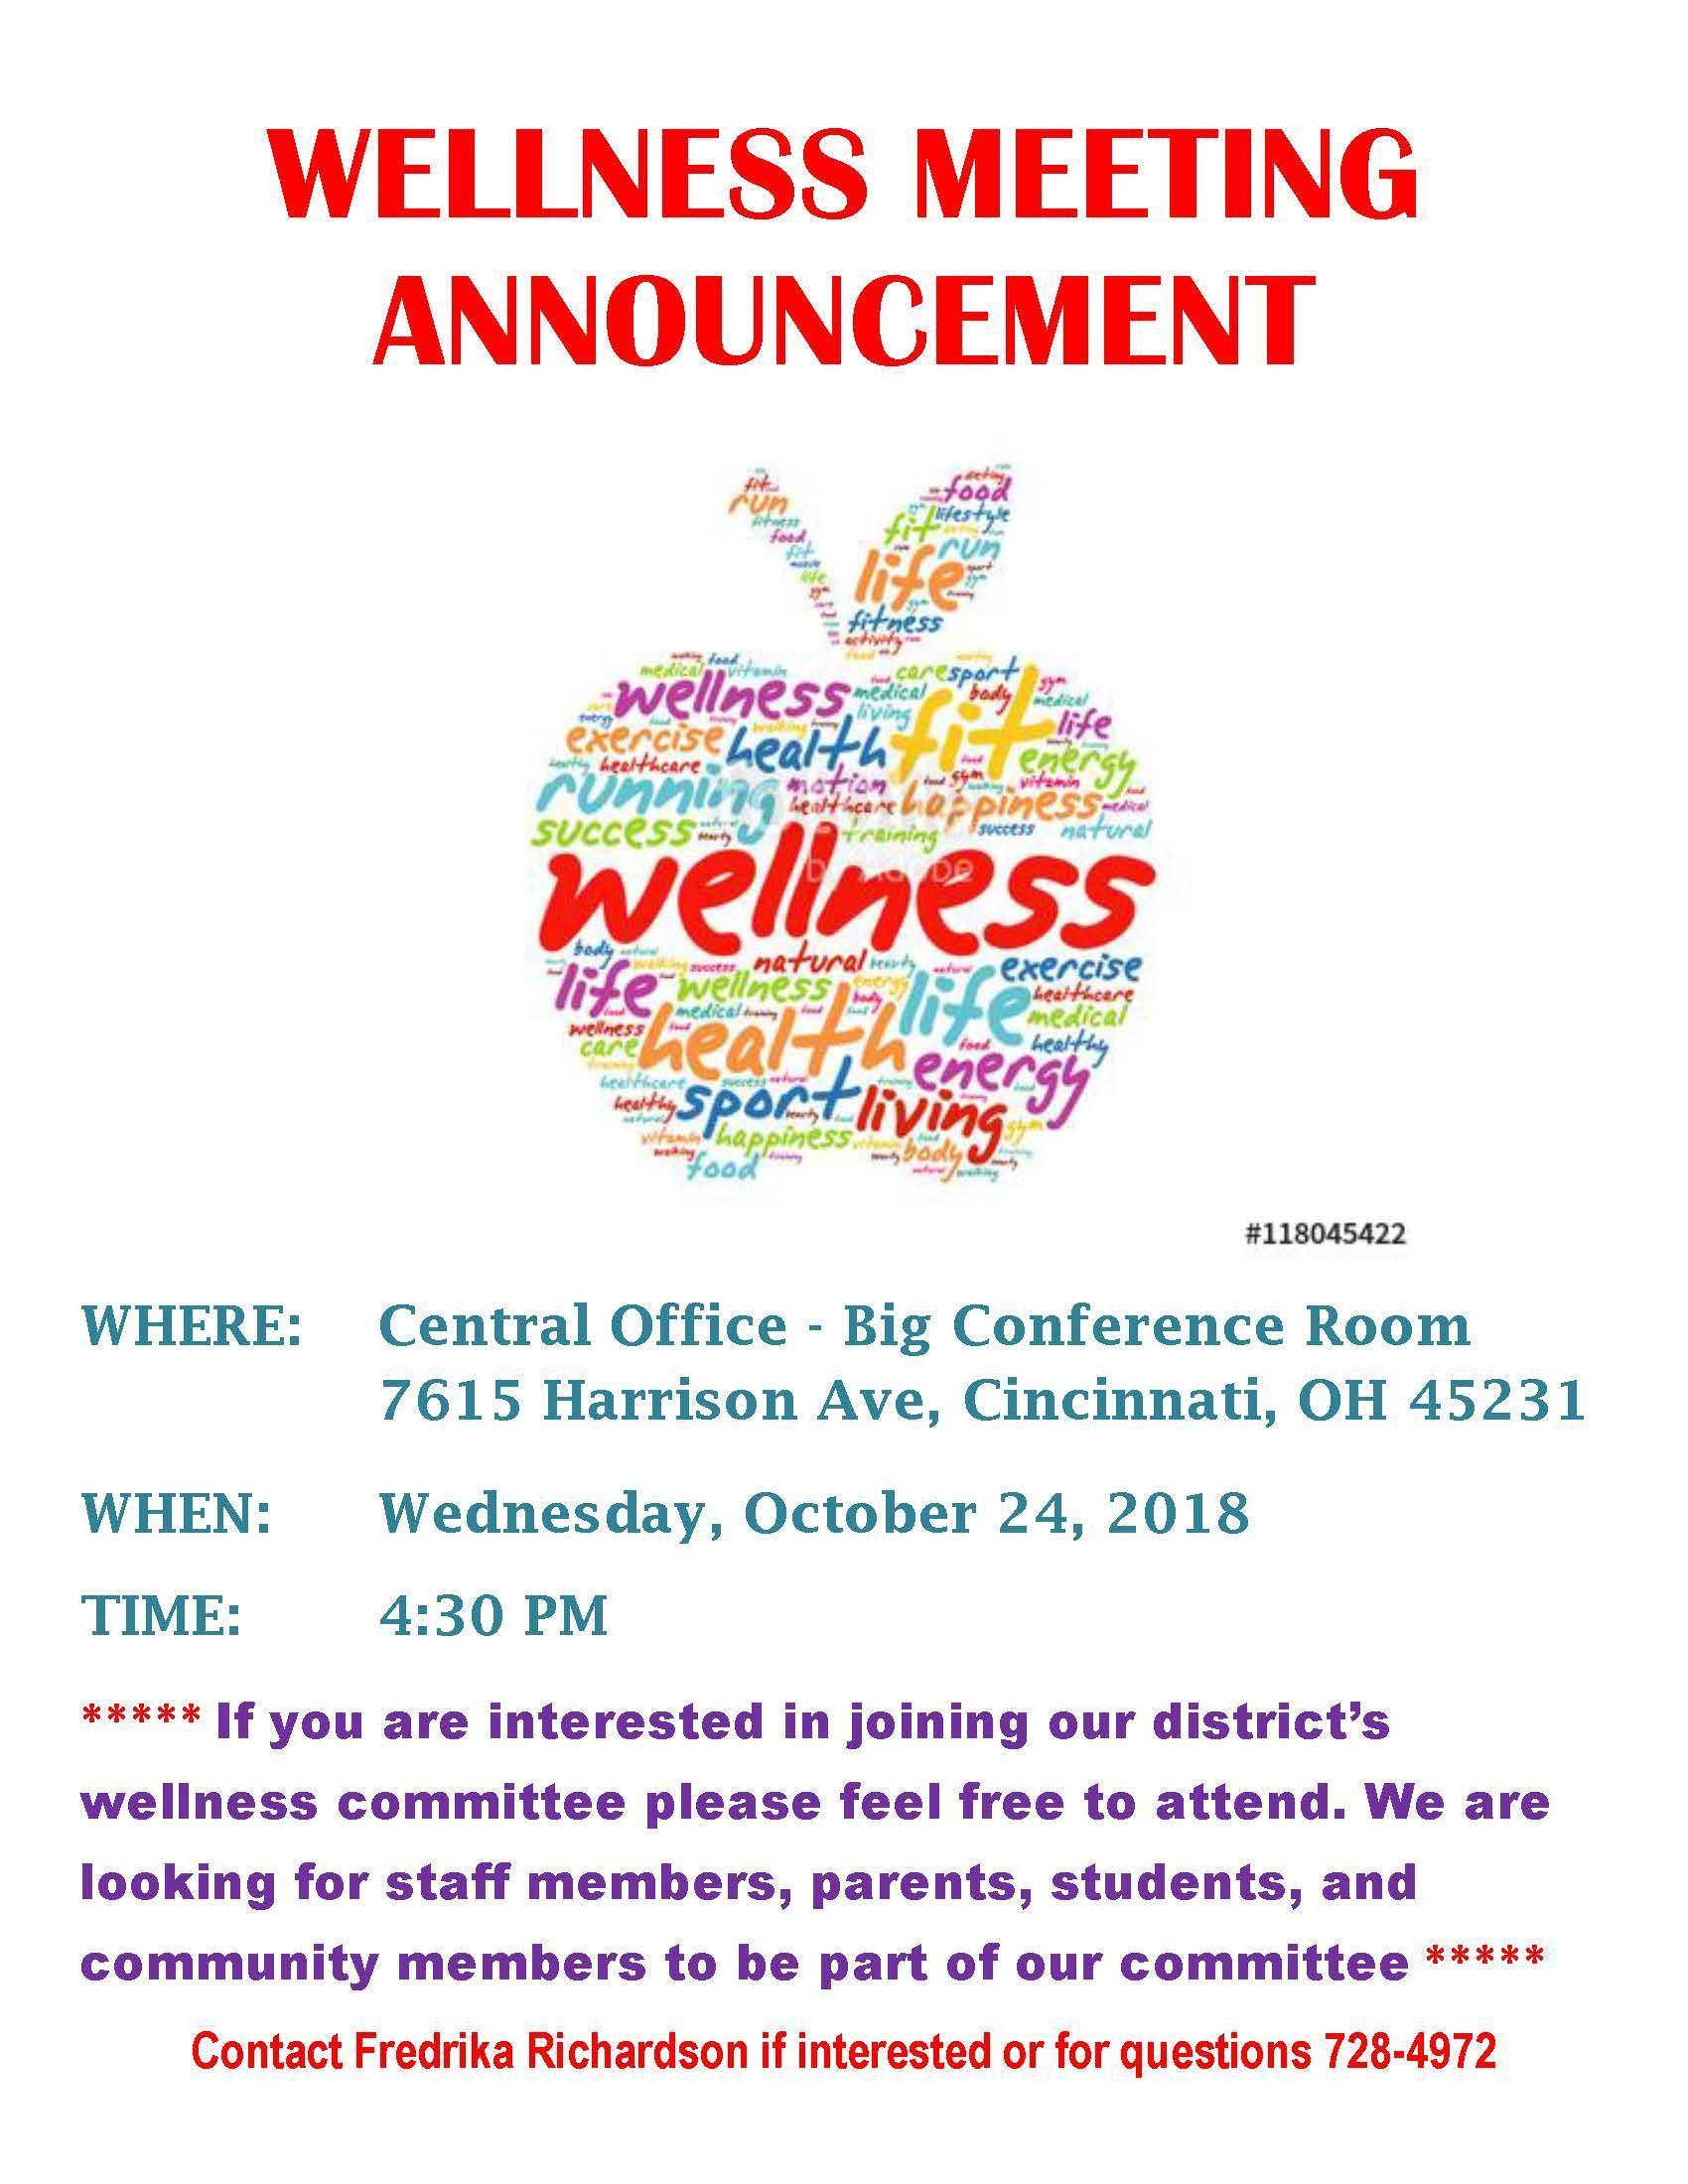 October 24, 2018 Wellness Meeting